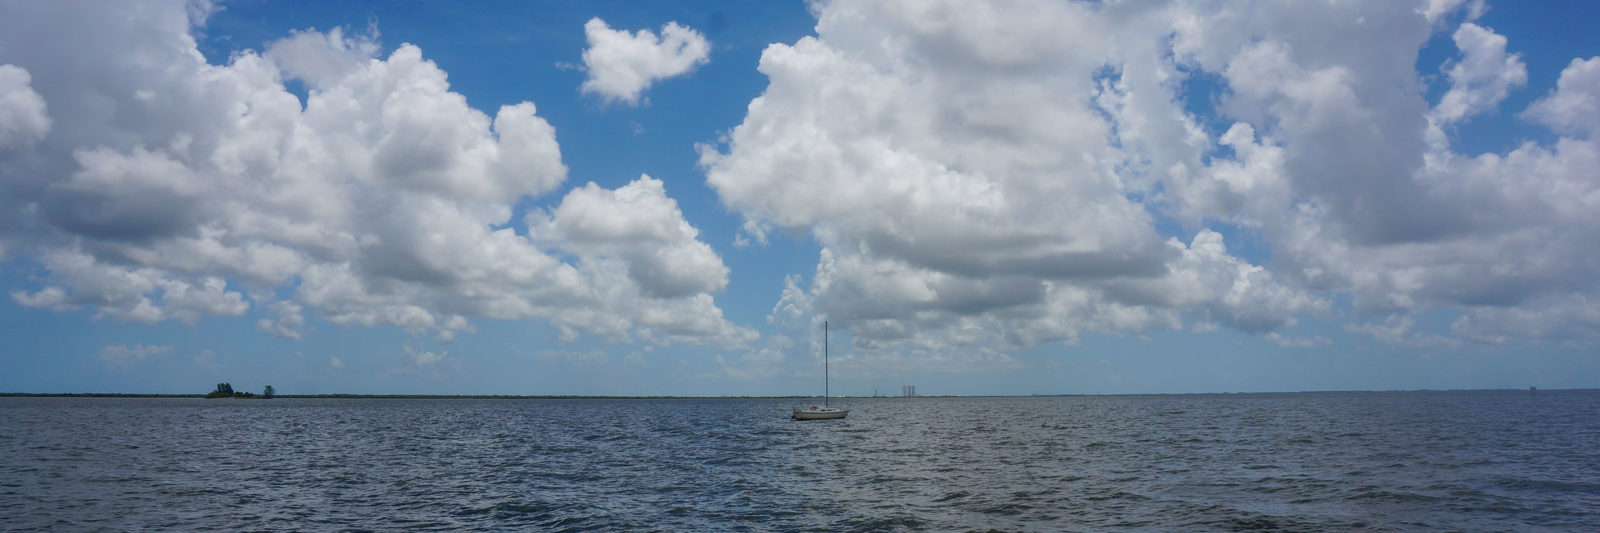 Sailboat on Indian River Lagoon